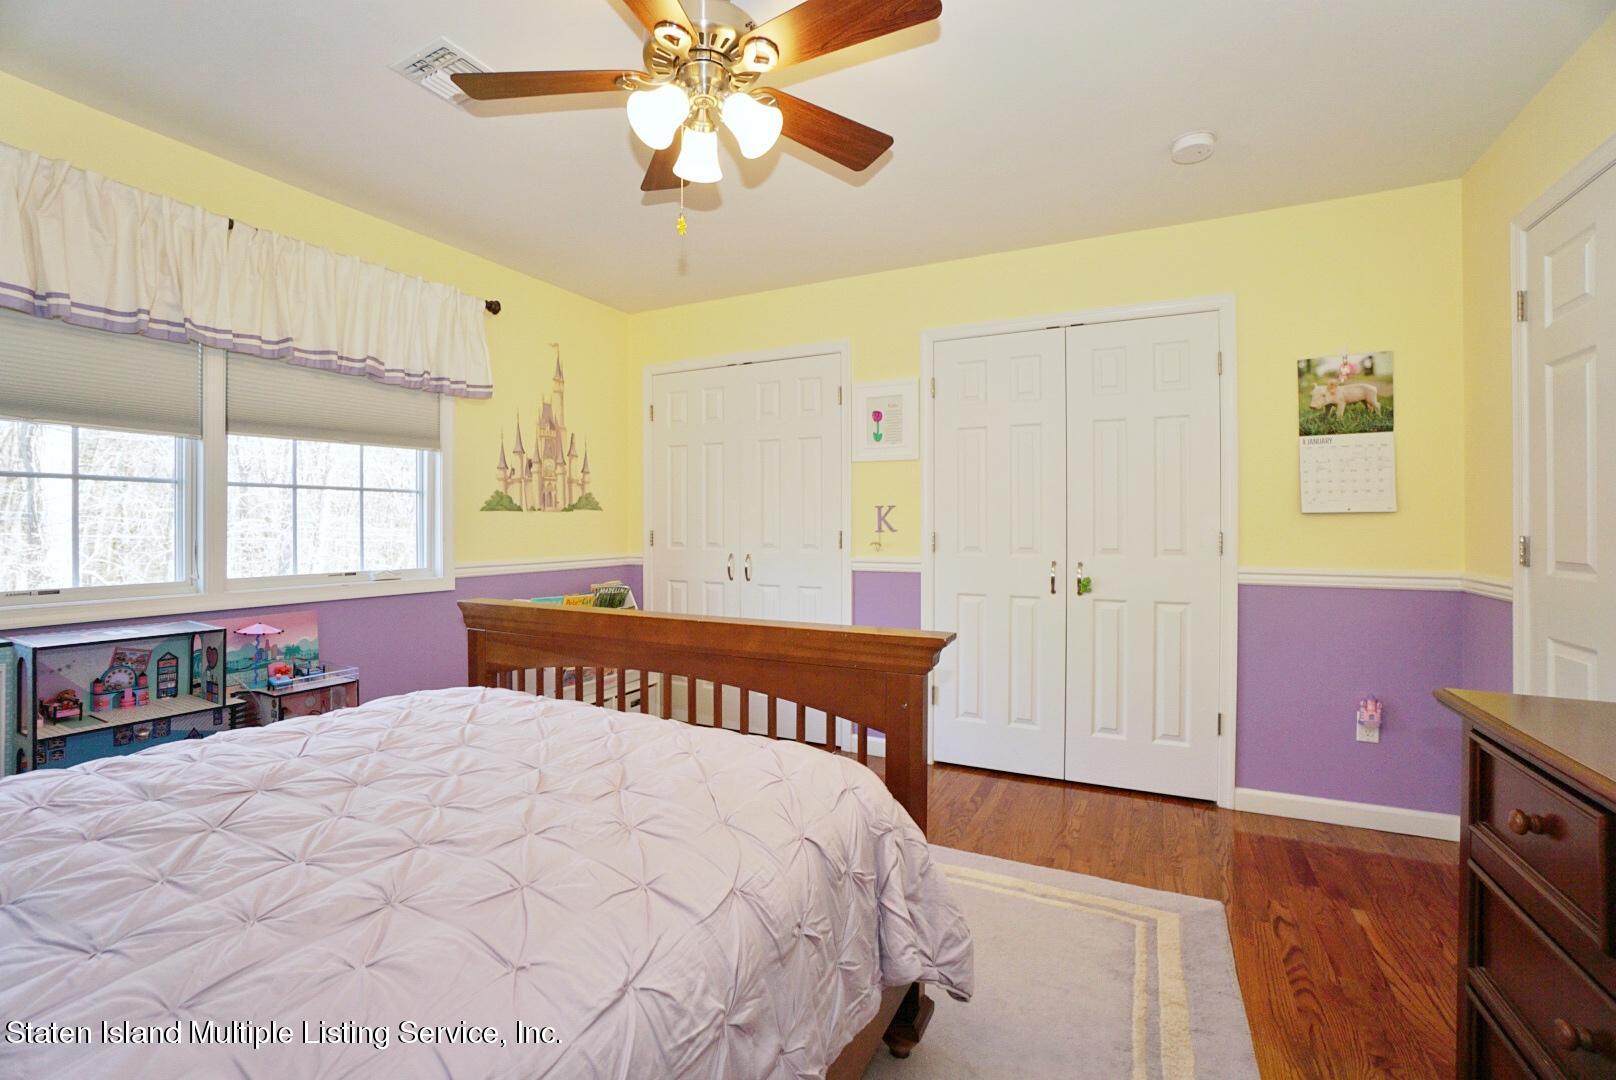 Single Family - Detached 31 Belwood Loop  Staten Island, NY 10307, MLS-1143133-48